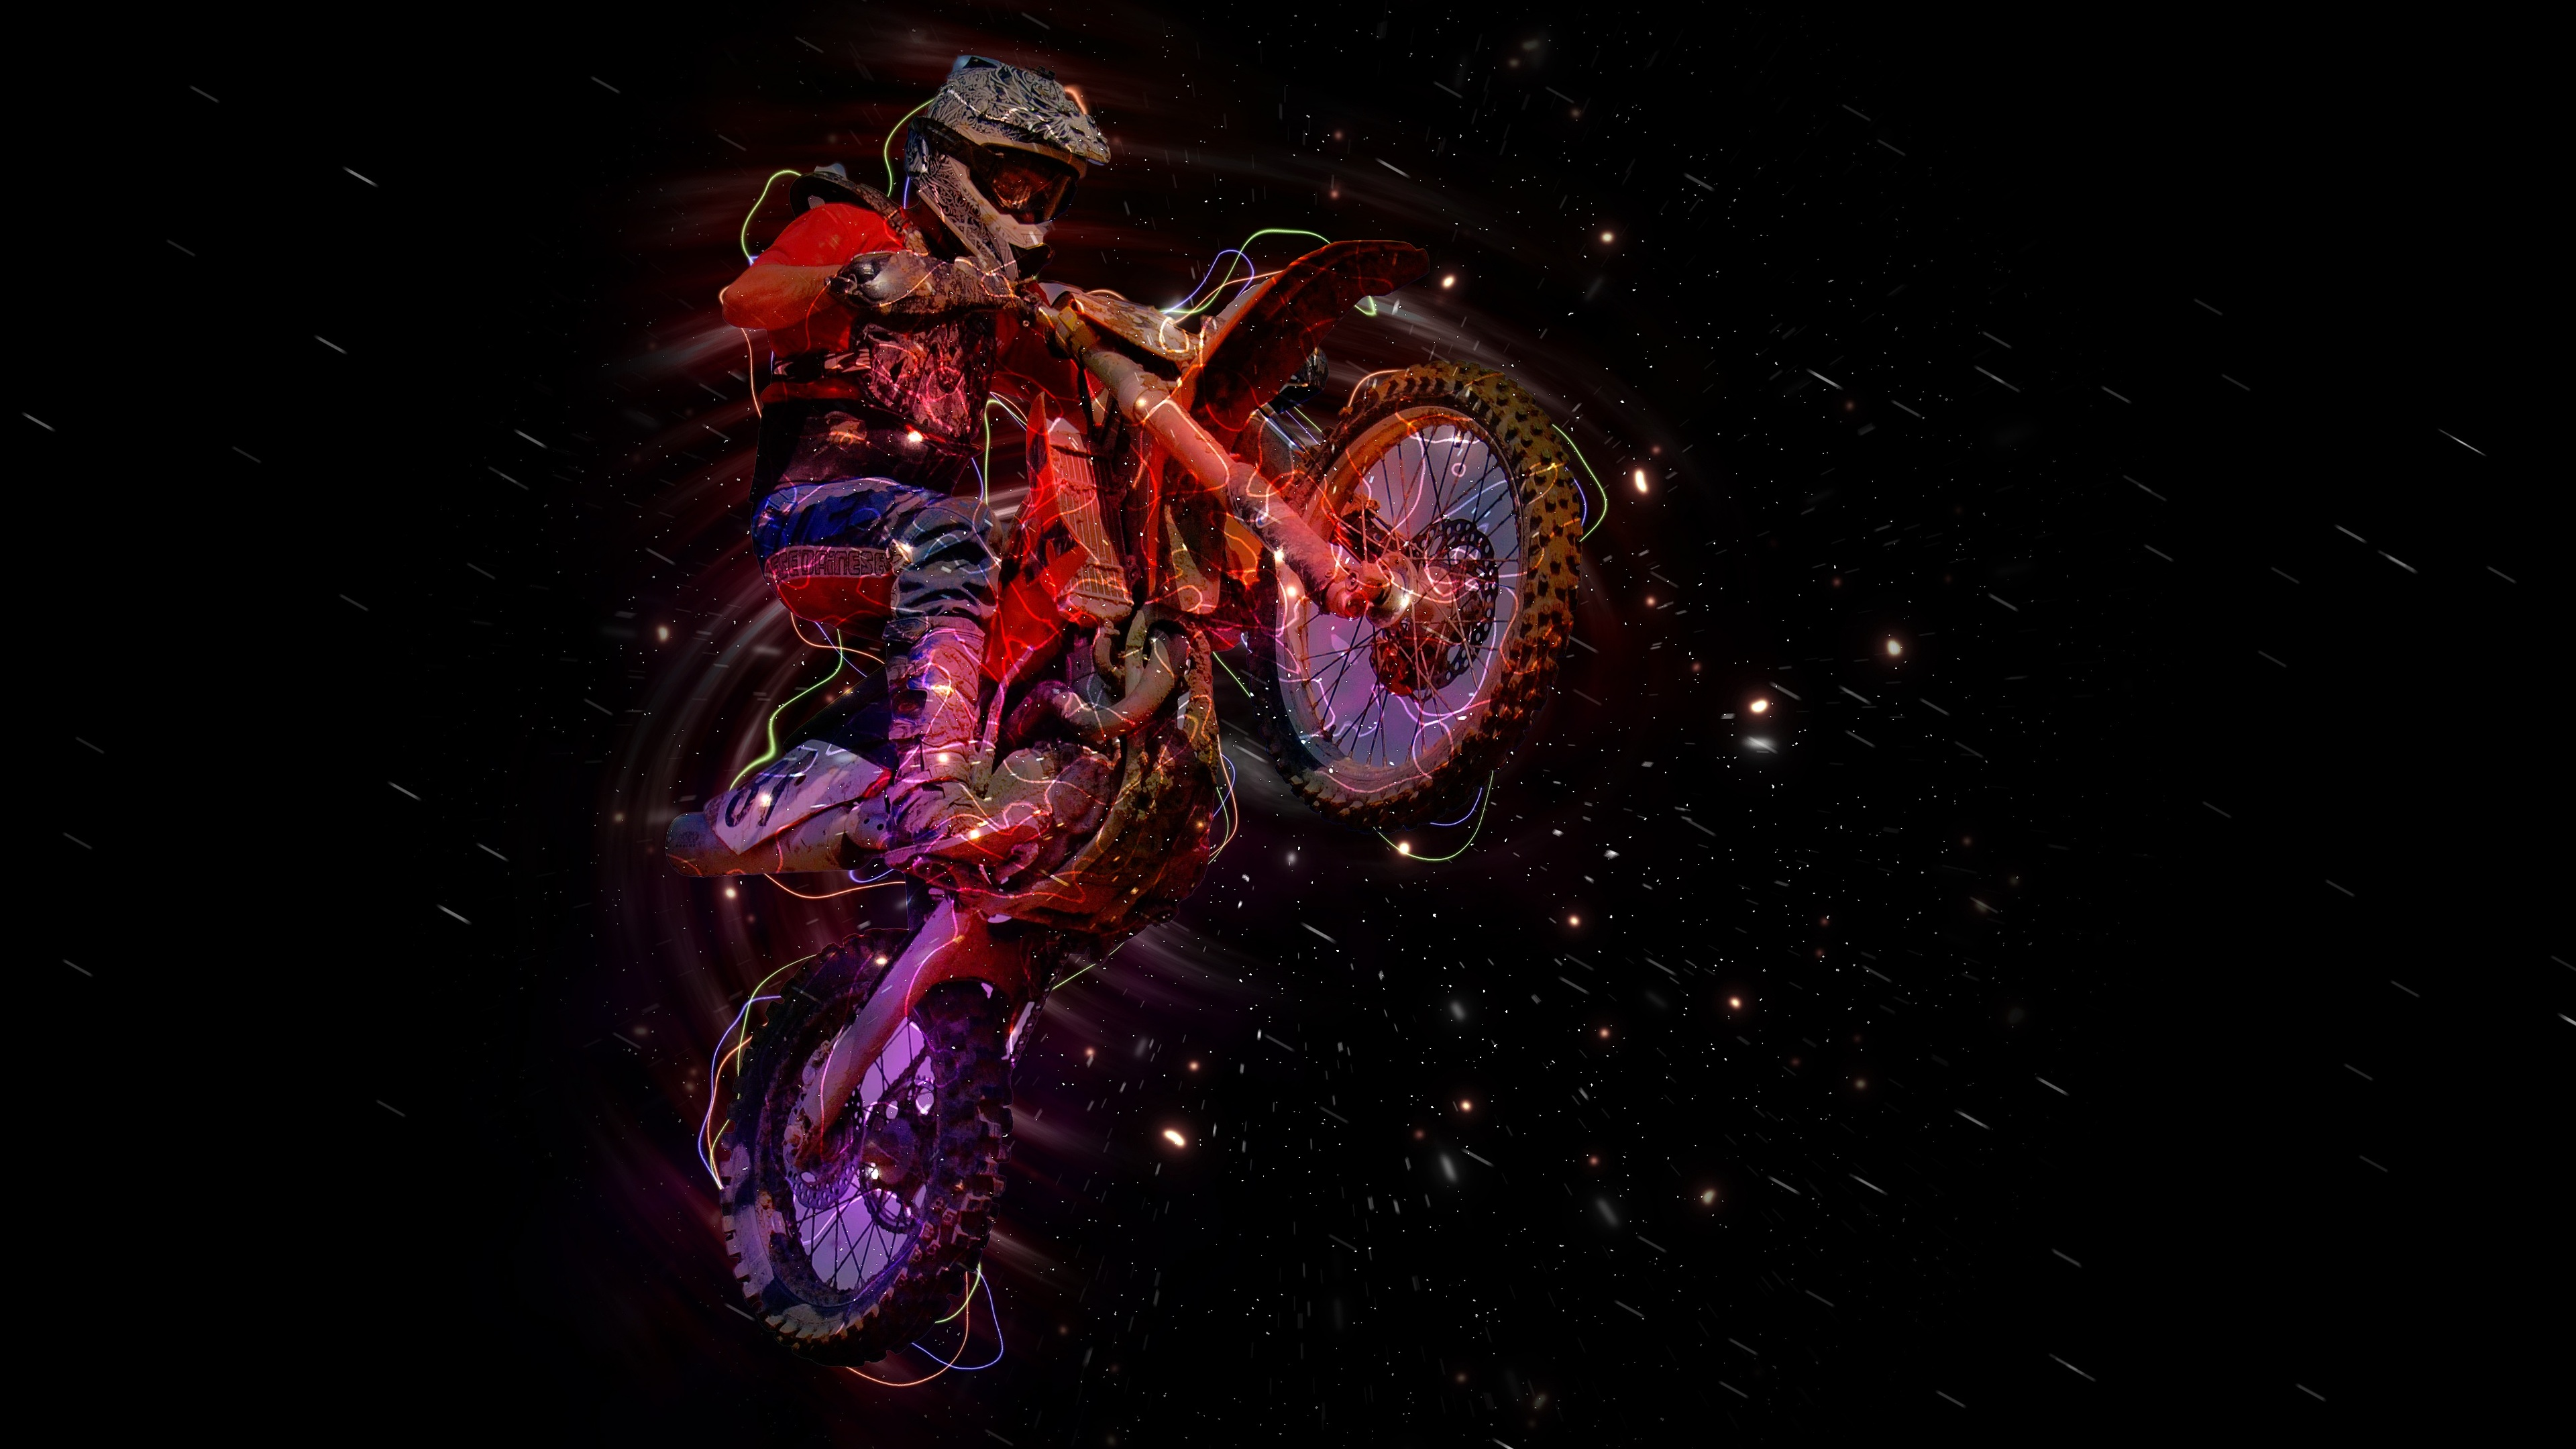 motorbike stunter artistic 5k 1536316362 - Motorbike Stunter Artistic 5k - hd-wallpapers, bikes wallpapers, artistic wallpapers, 5k wallpapers, 4k-wallpapers